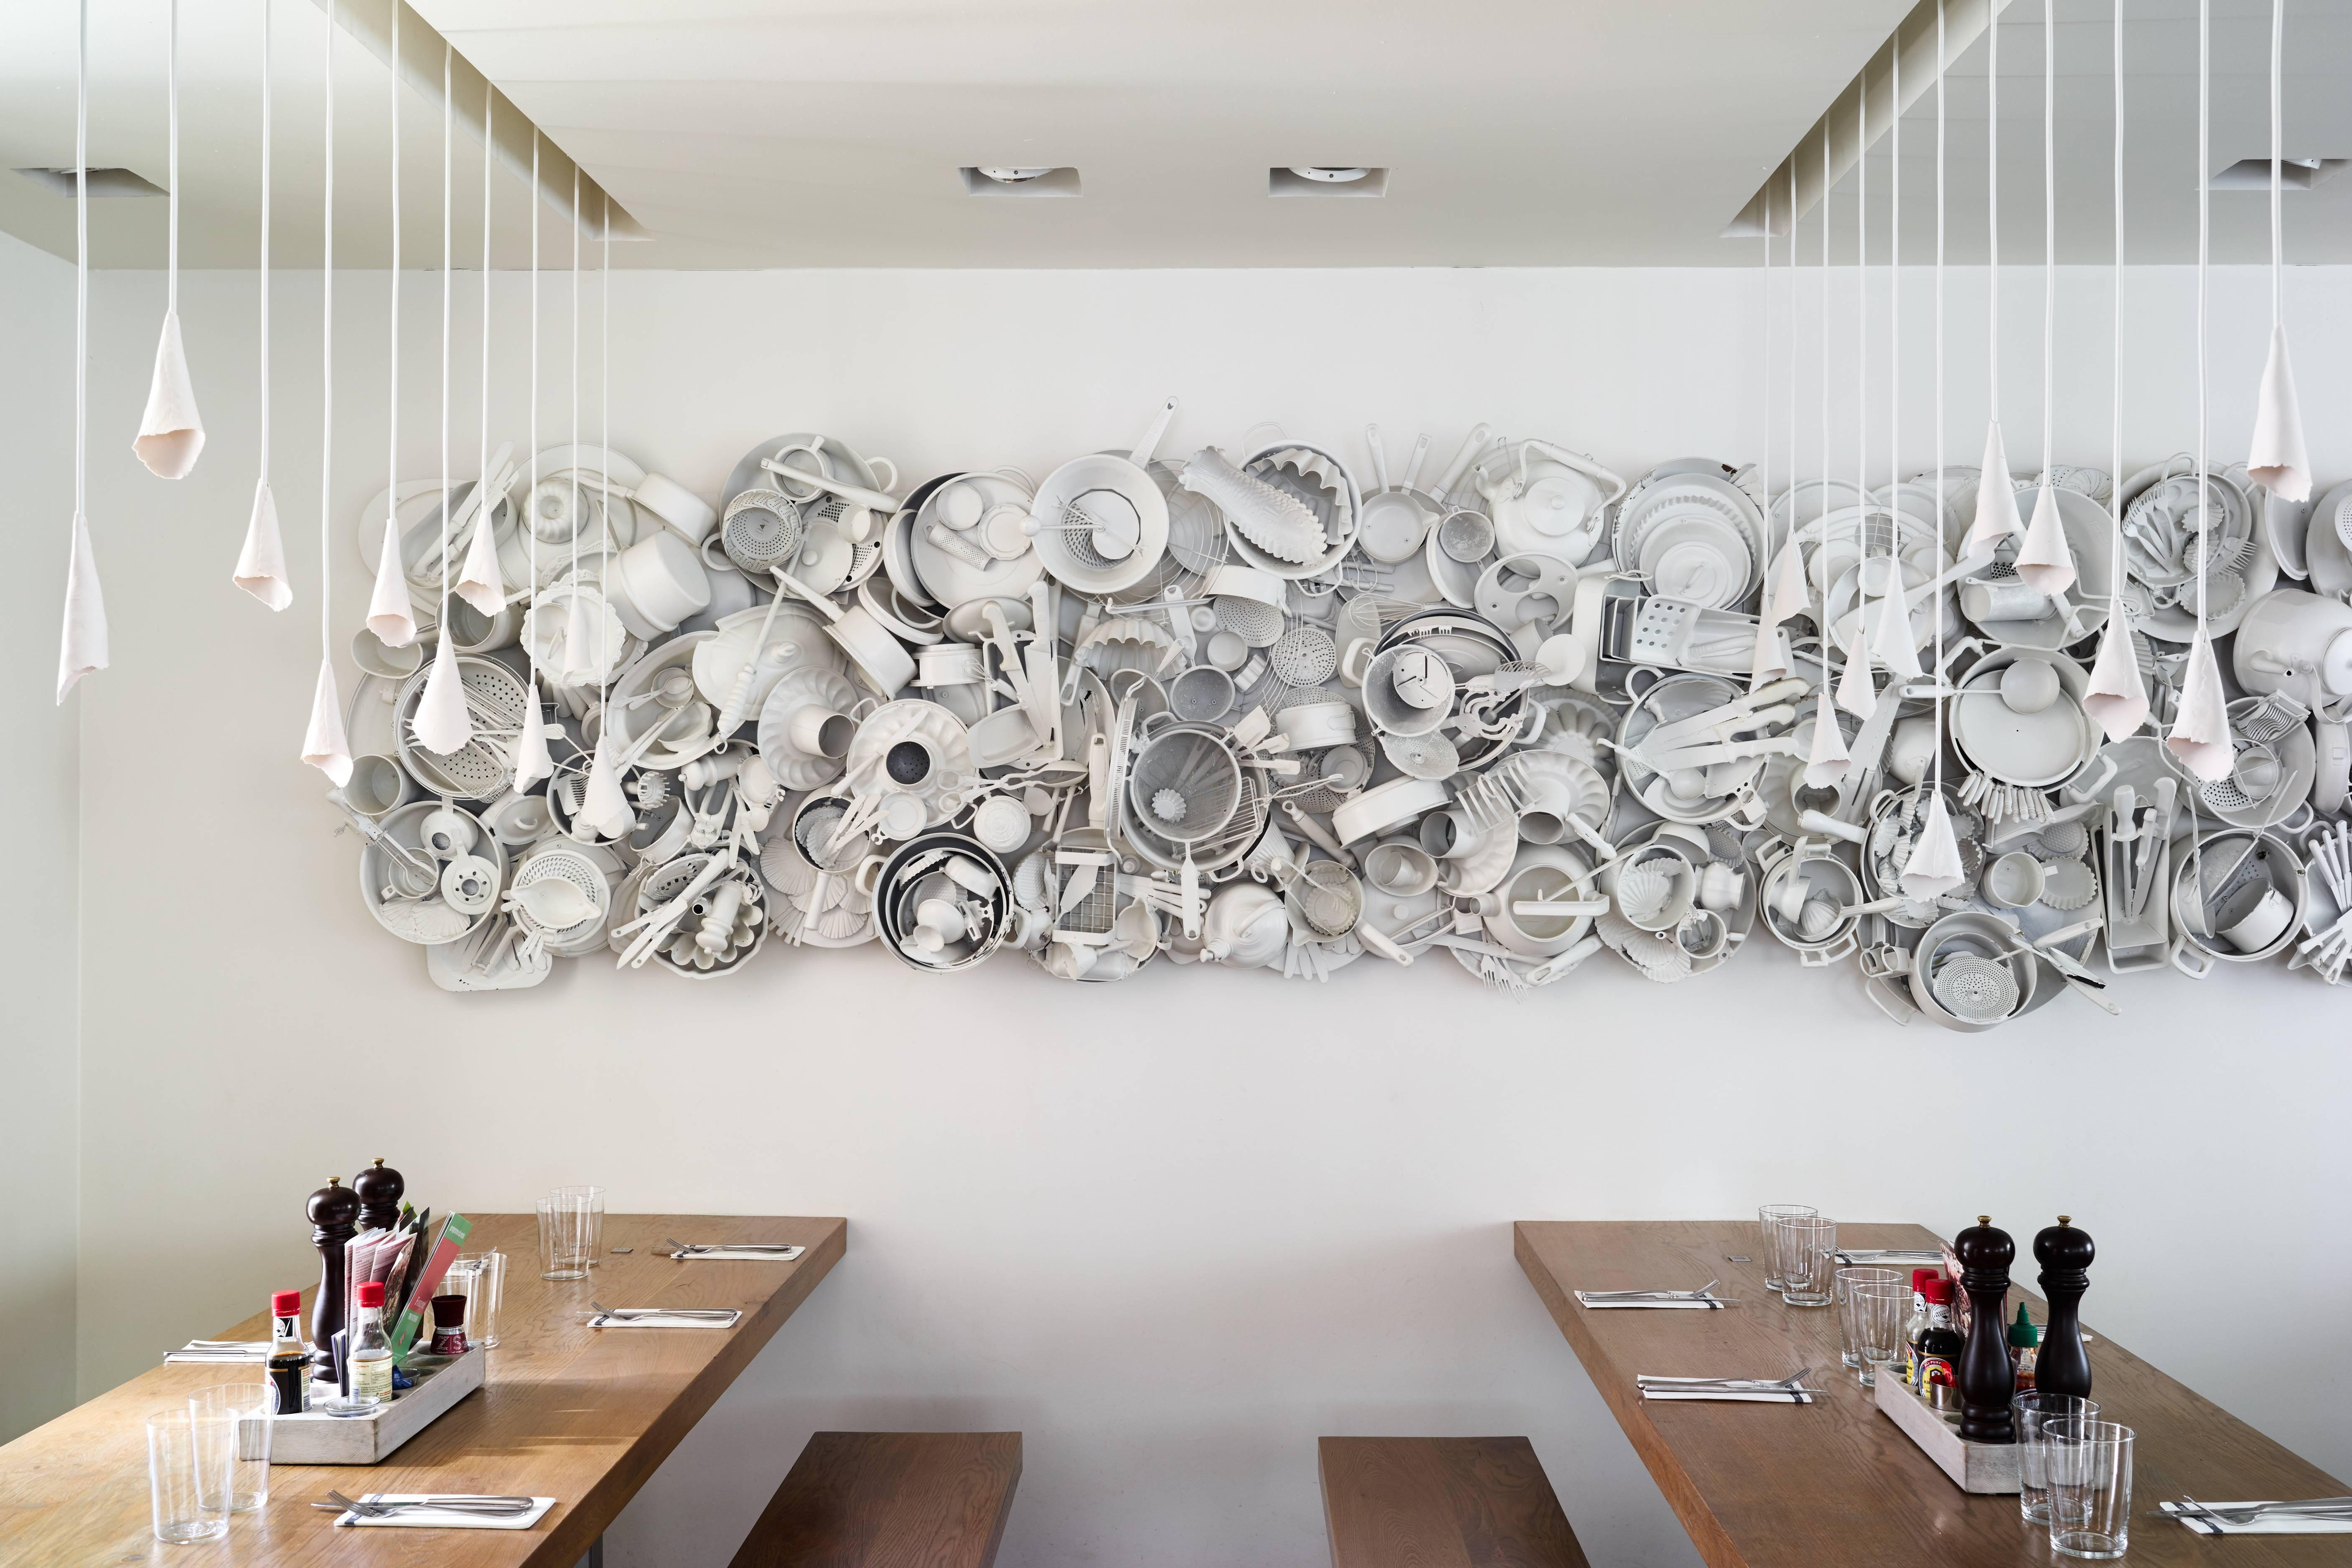 Contemporary No Limits Kitchen Utensils Fine Art Wall Sculptures For Sale